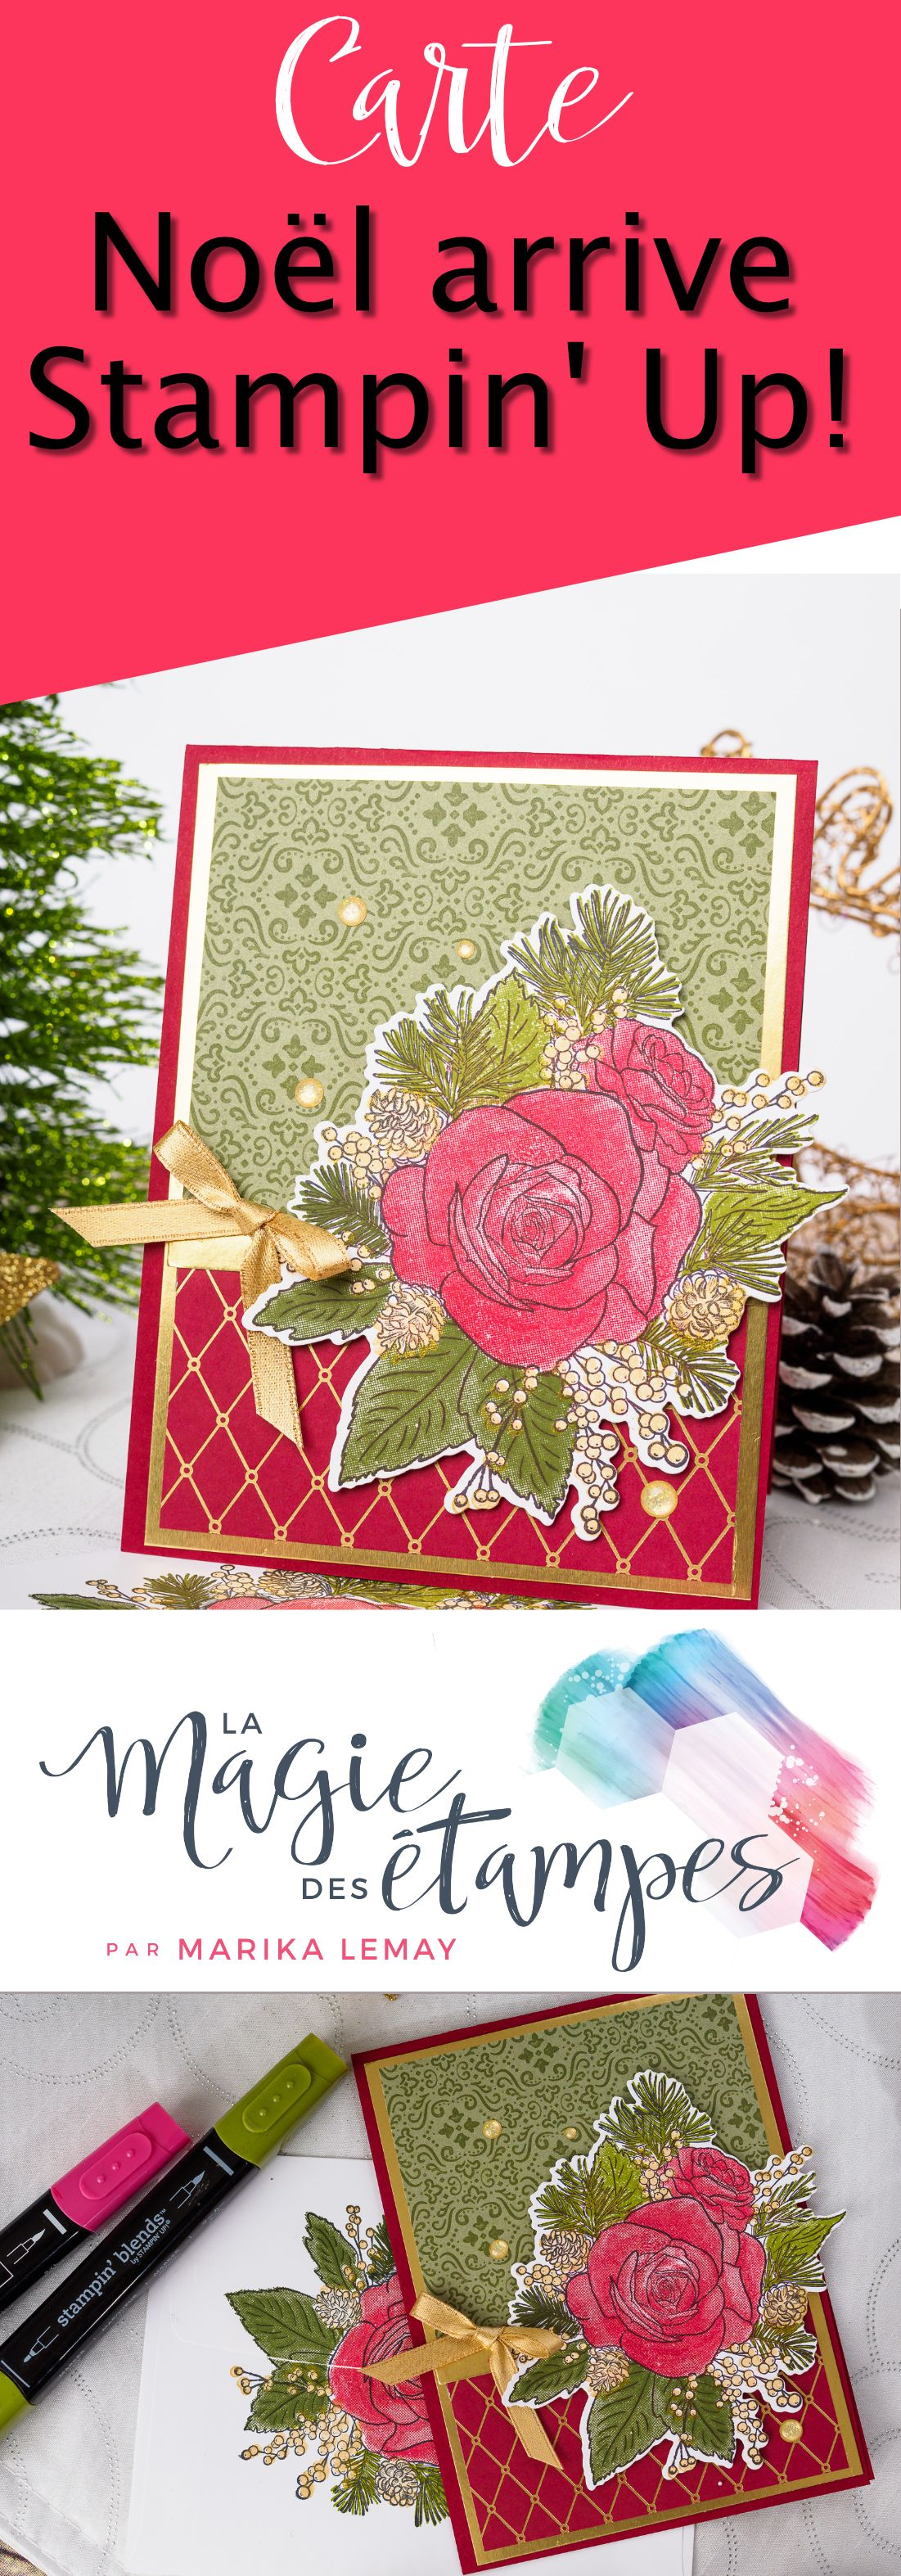 Une vidéo, 3 cartes de Noël Stampin' Up! | Christmas cards, Cards